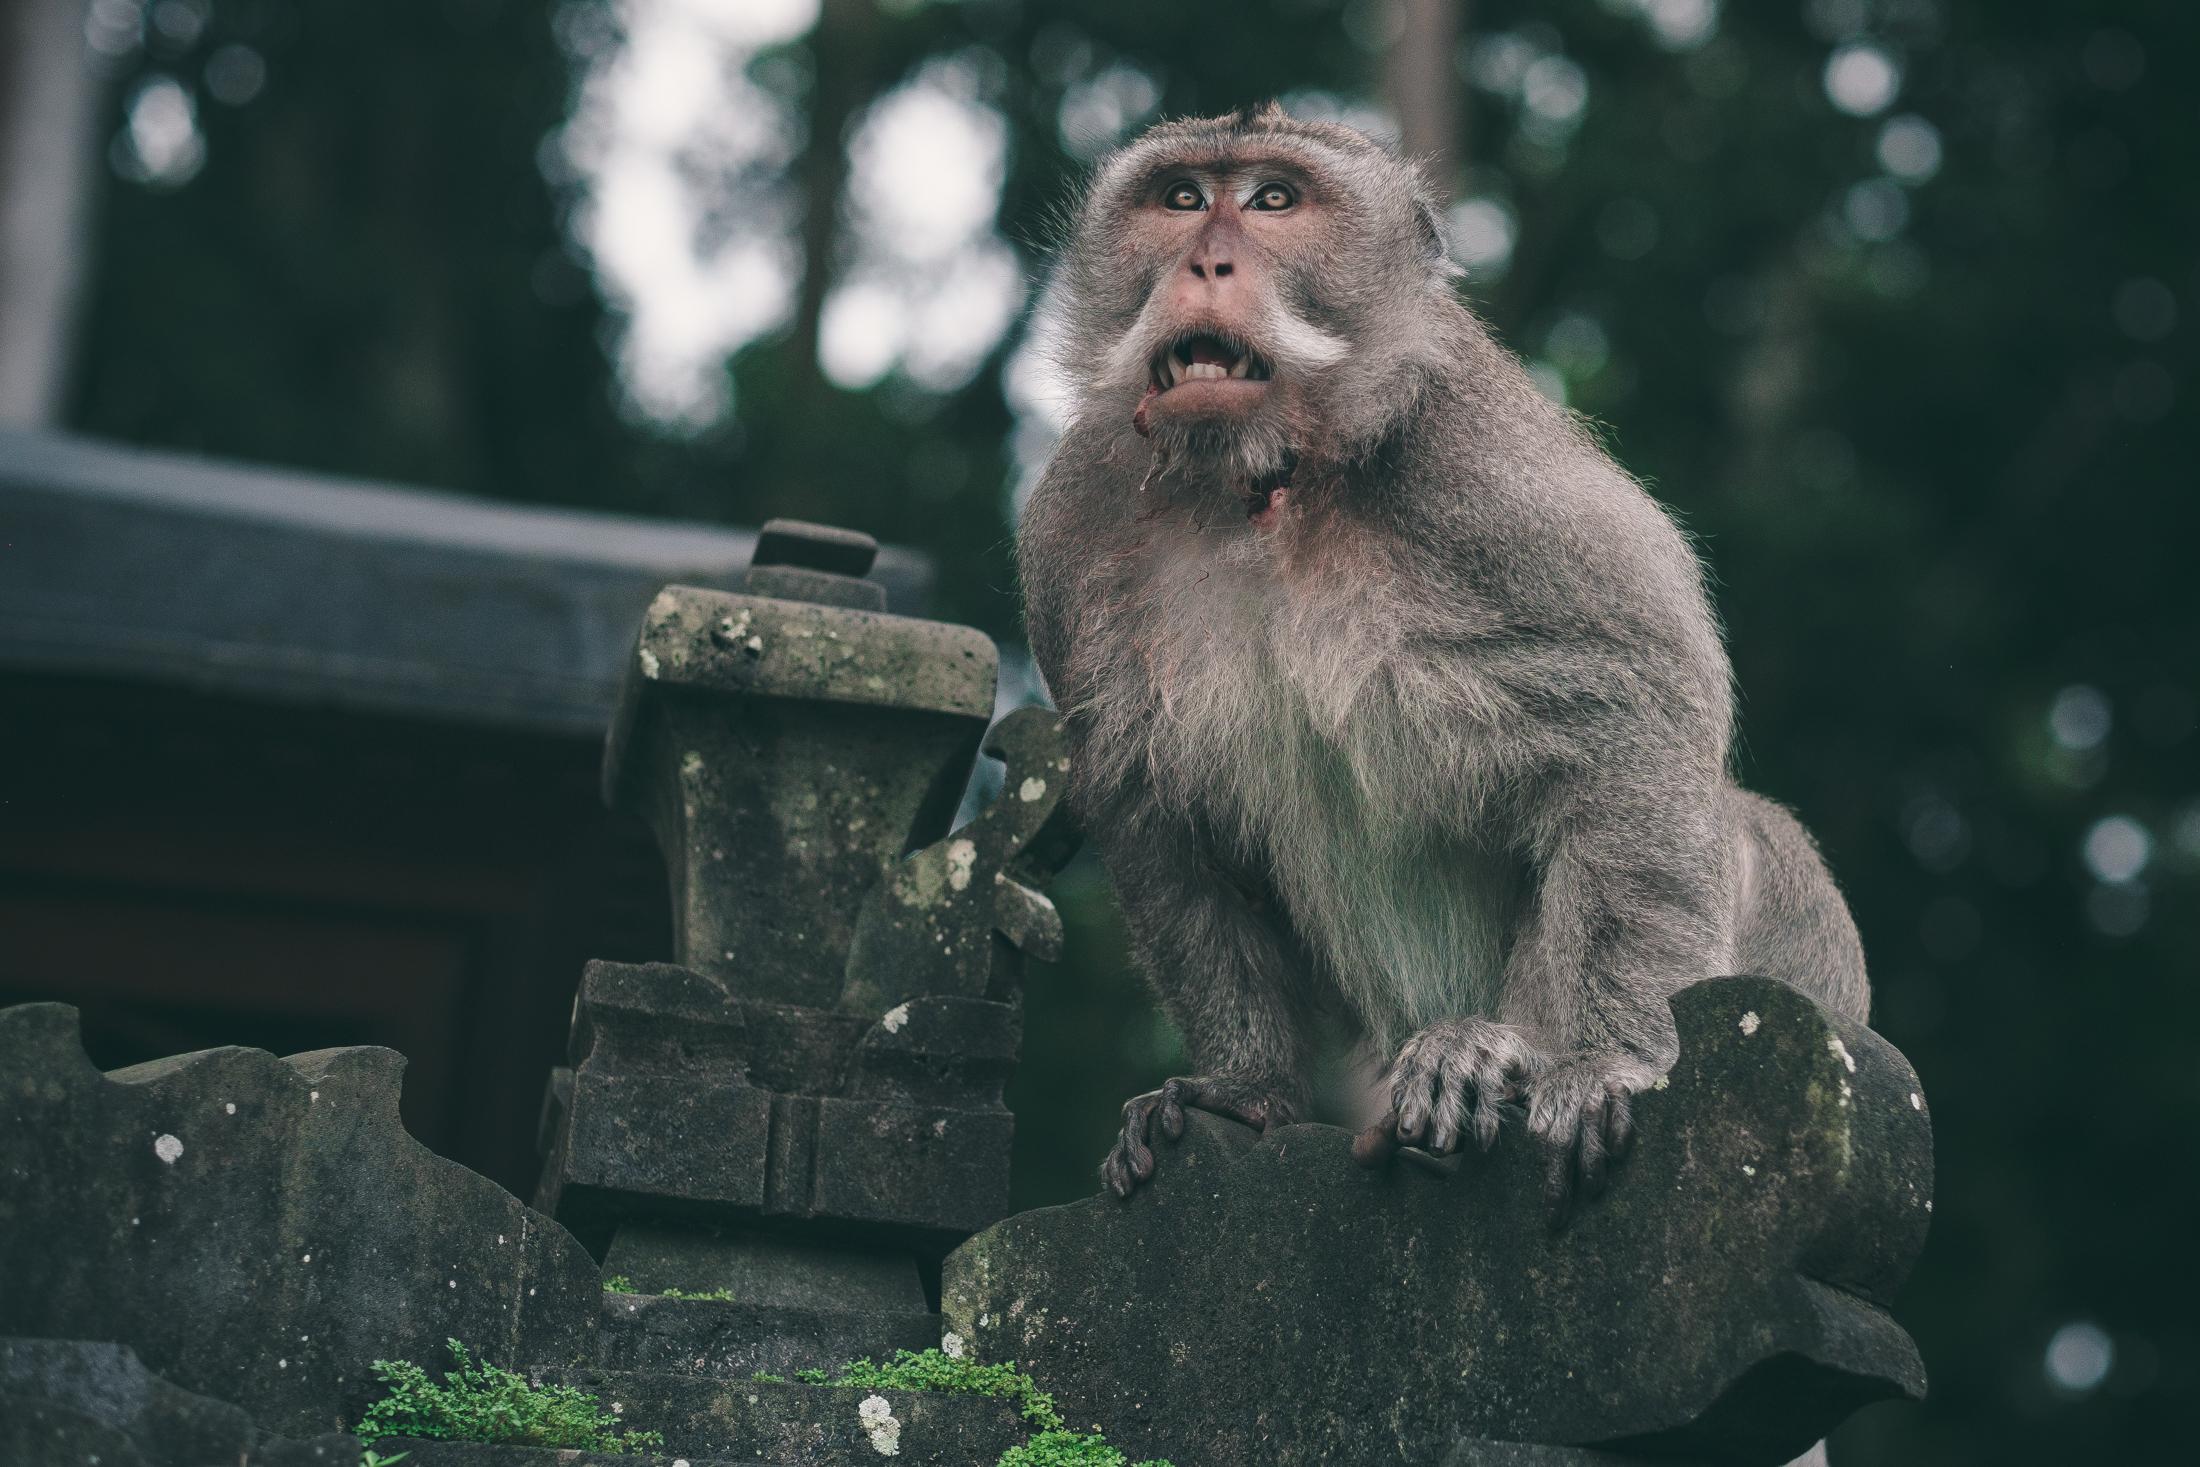 bali_day9_monkey-35.jpg